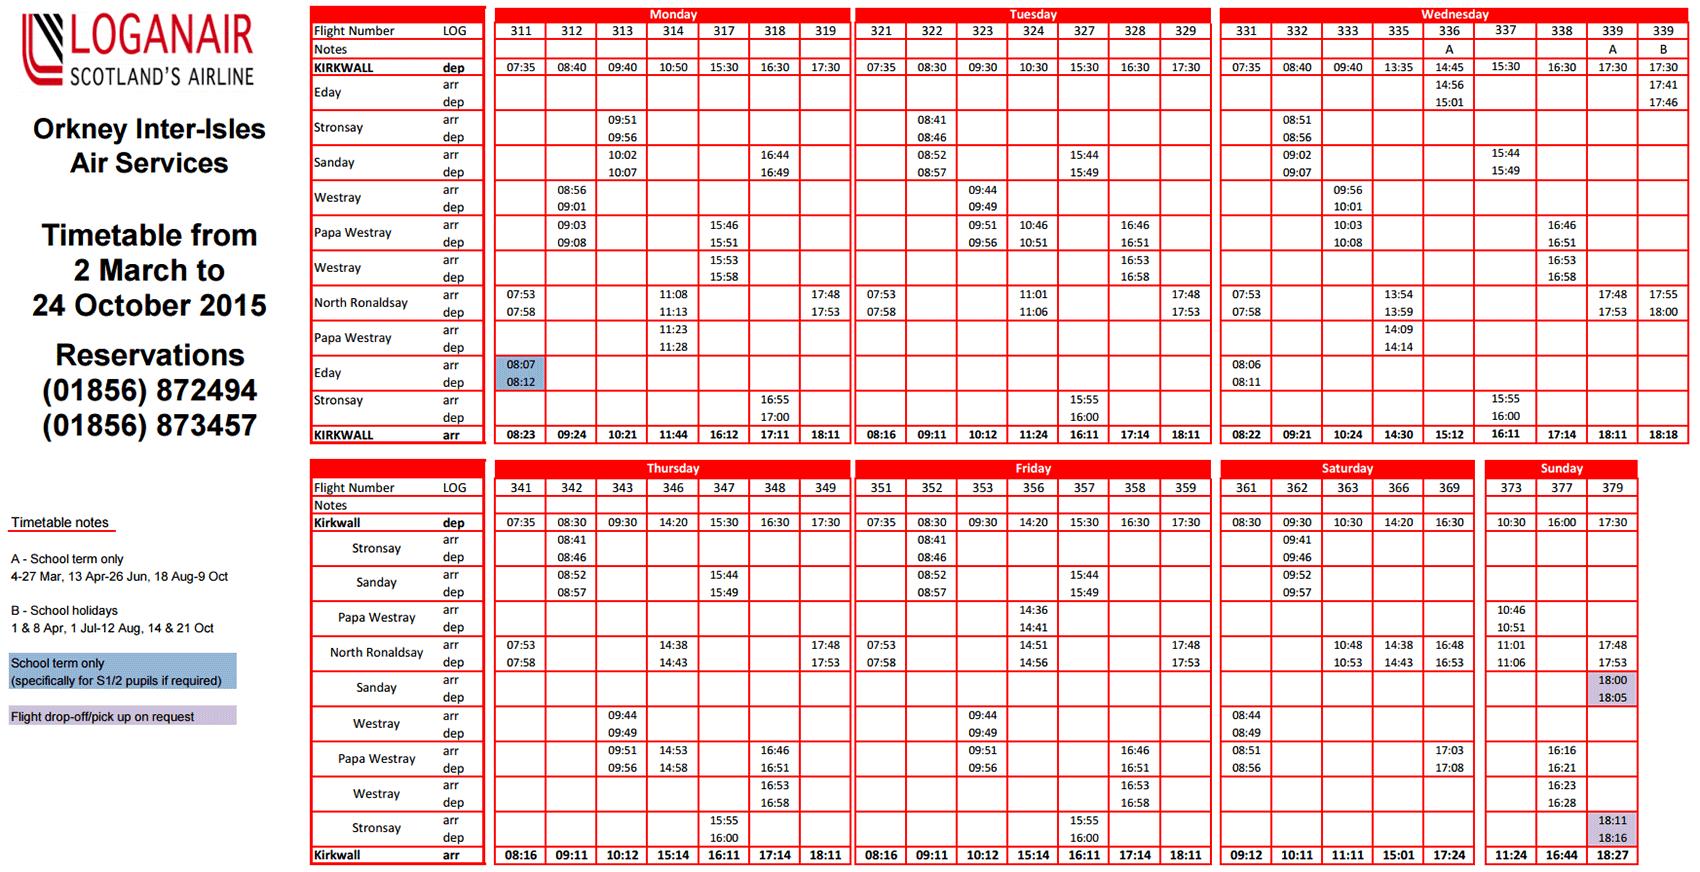 Loganair timetable